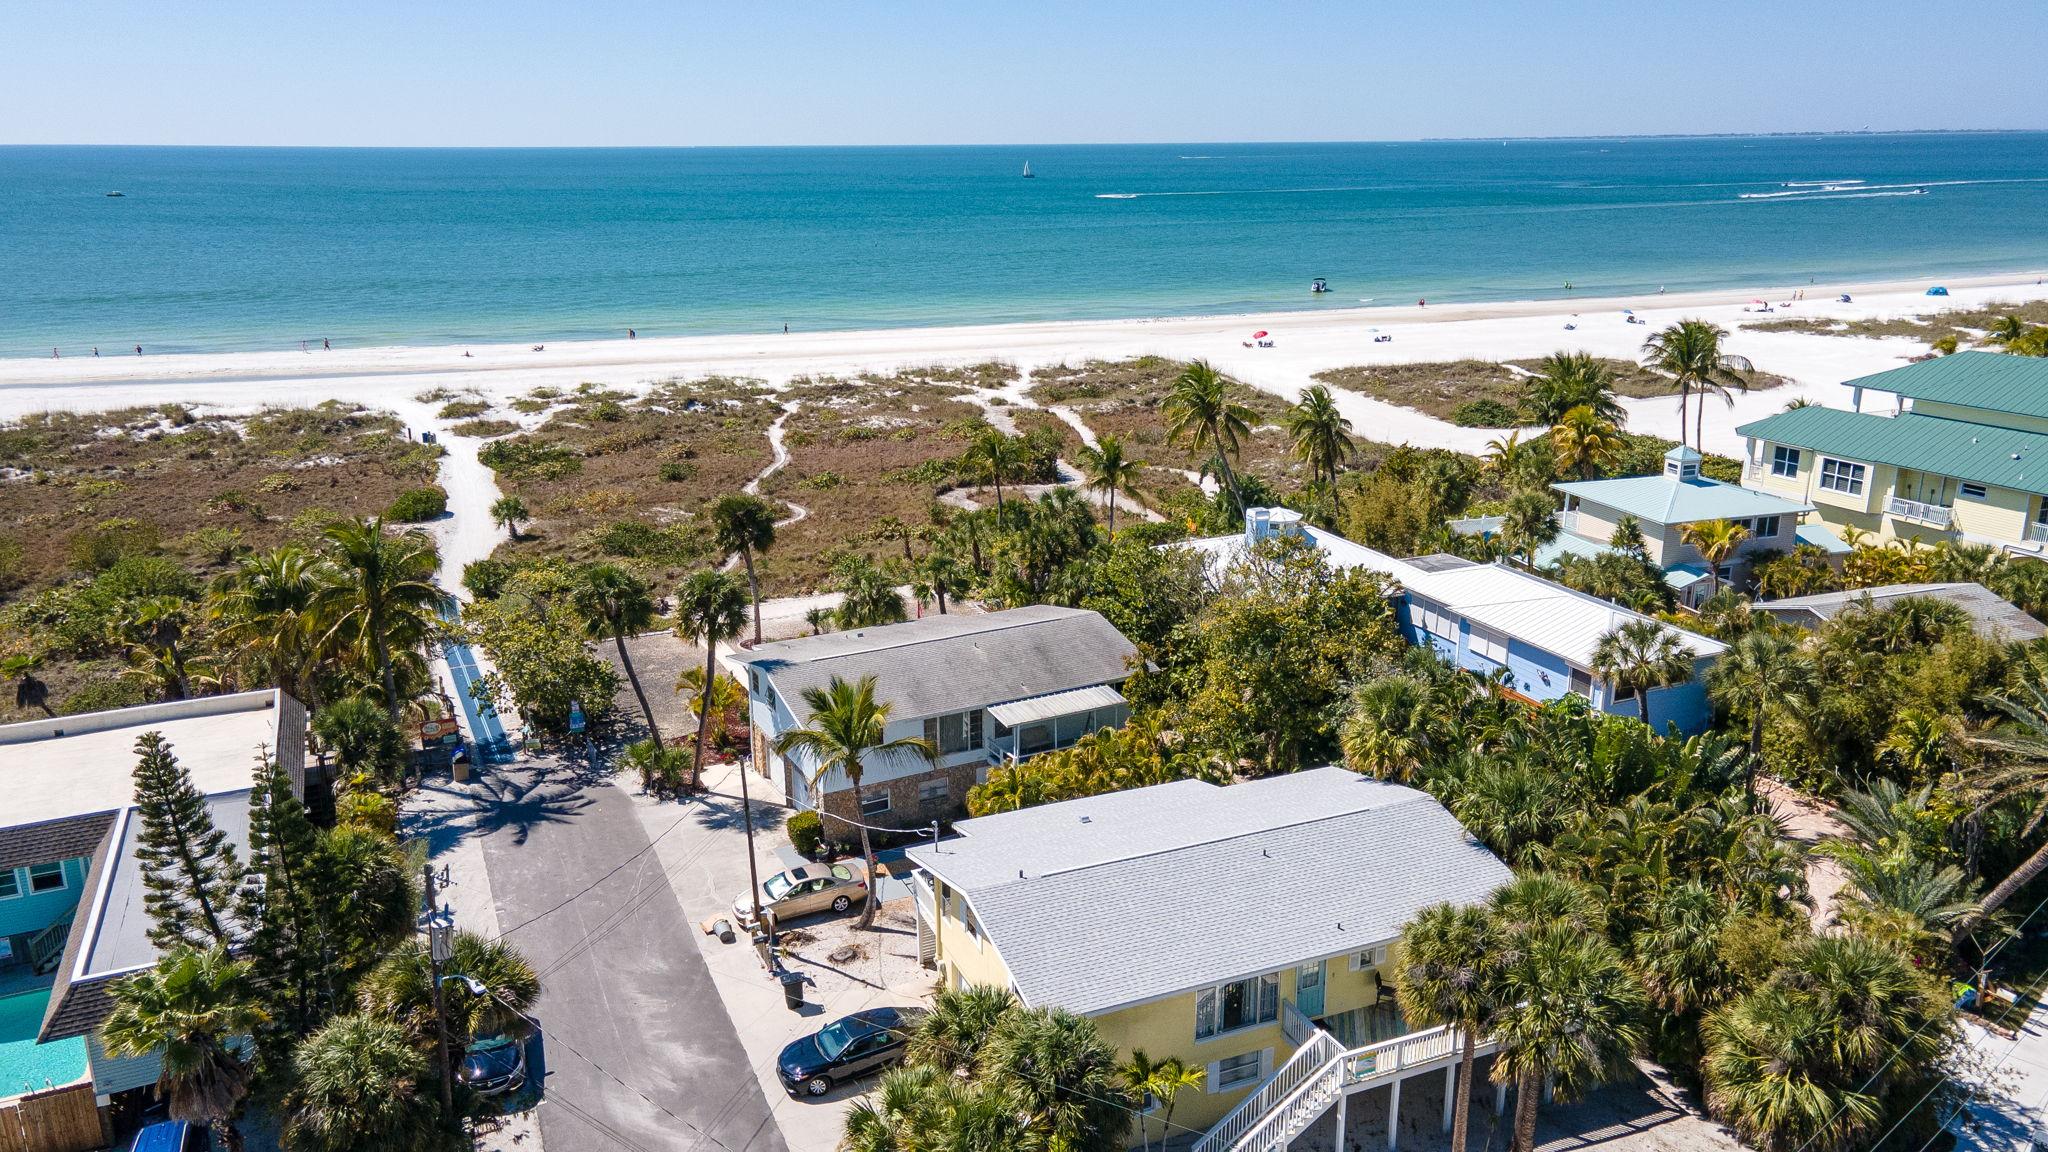 Thumbnail image of Gulf Drive Paradise